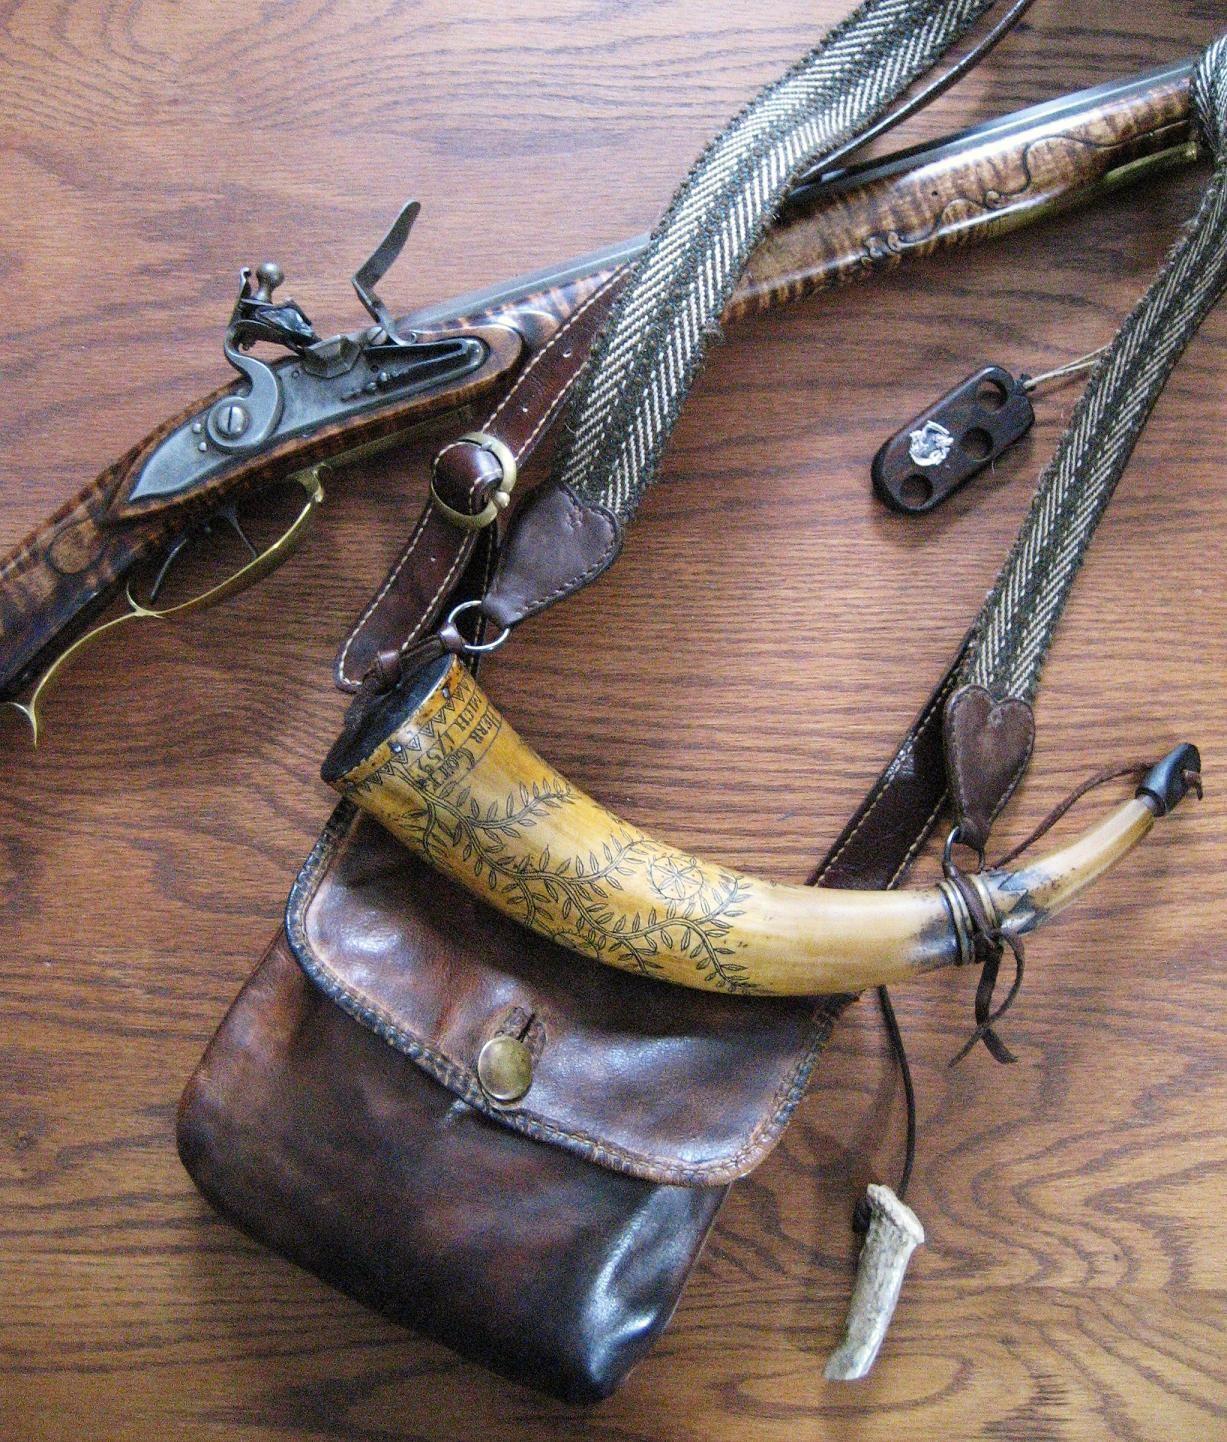 ".50 rifle  Bag & other leather work - Jeanne McDonald  Buckle - Rich McDonald  PA German inscription horn - Mike Hawkins  Linen/wool woven strap - C.J. Wilde  Powder measure - ""Spark"" Mumma  Rifle - R. Thomas Caster"